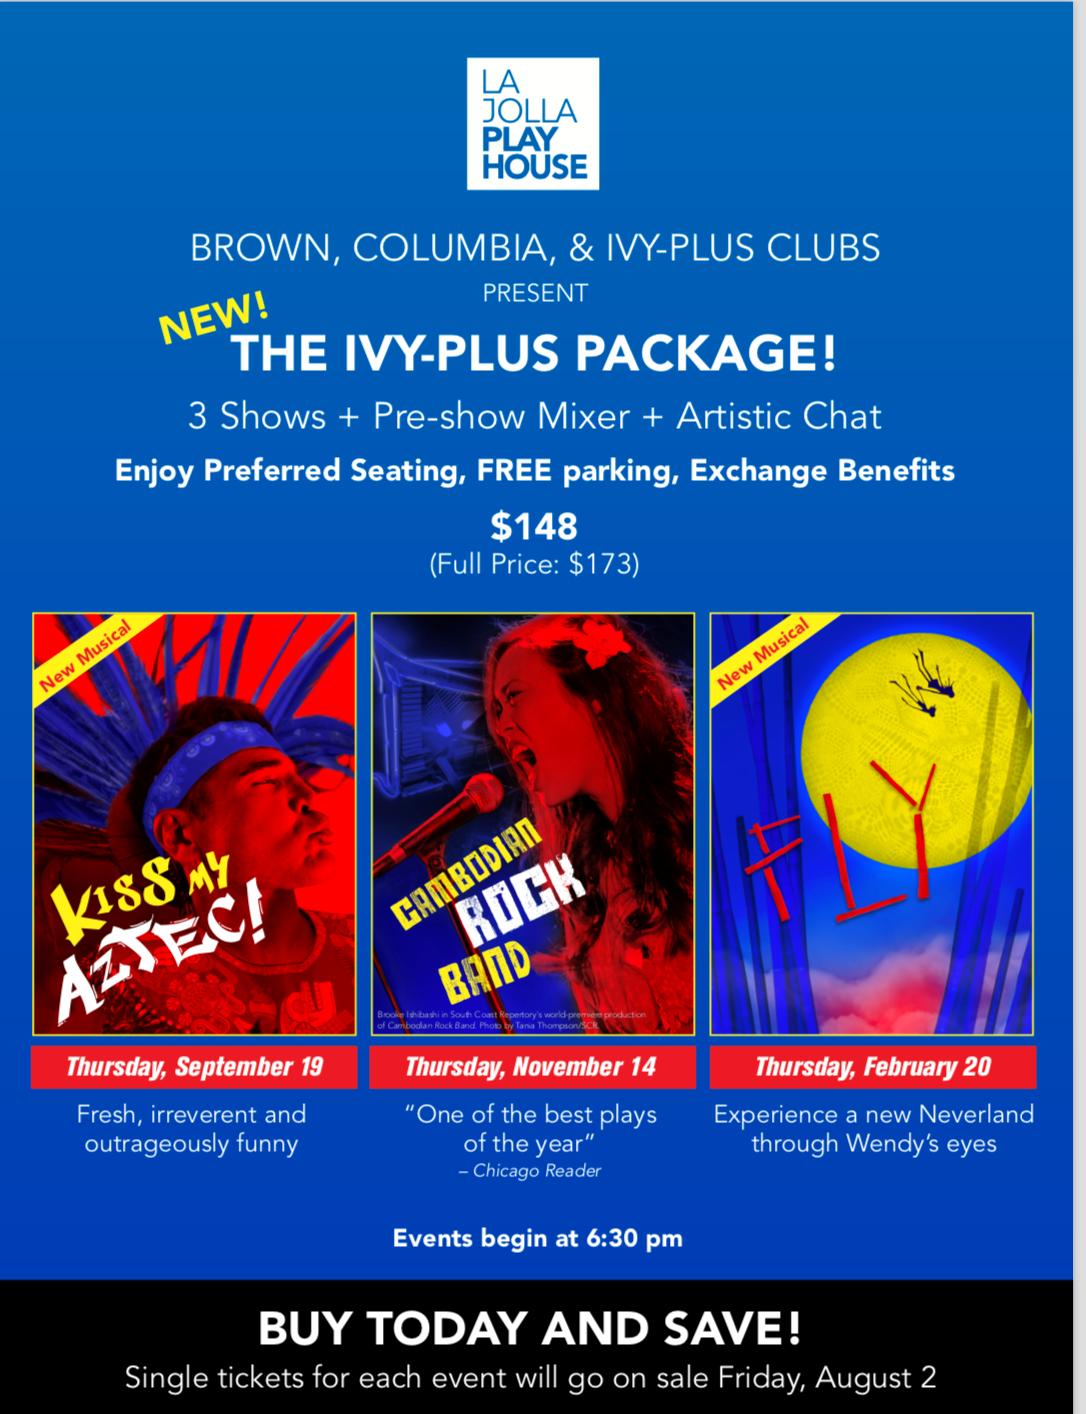 La_Jolla_Playhouse-Ivy__Package.png